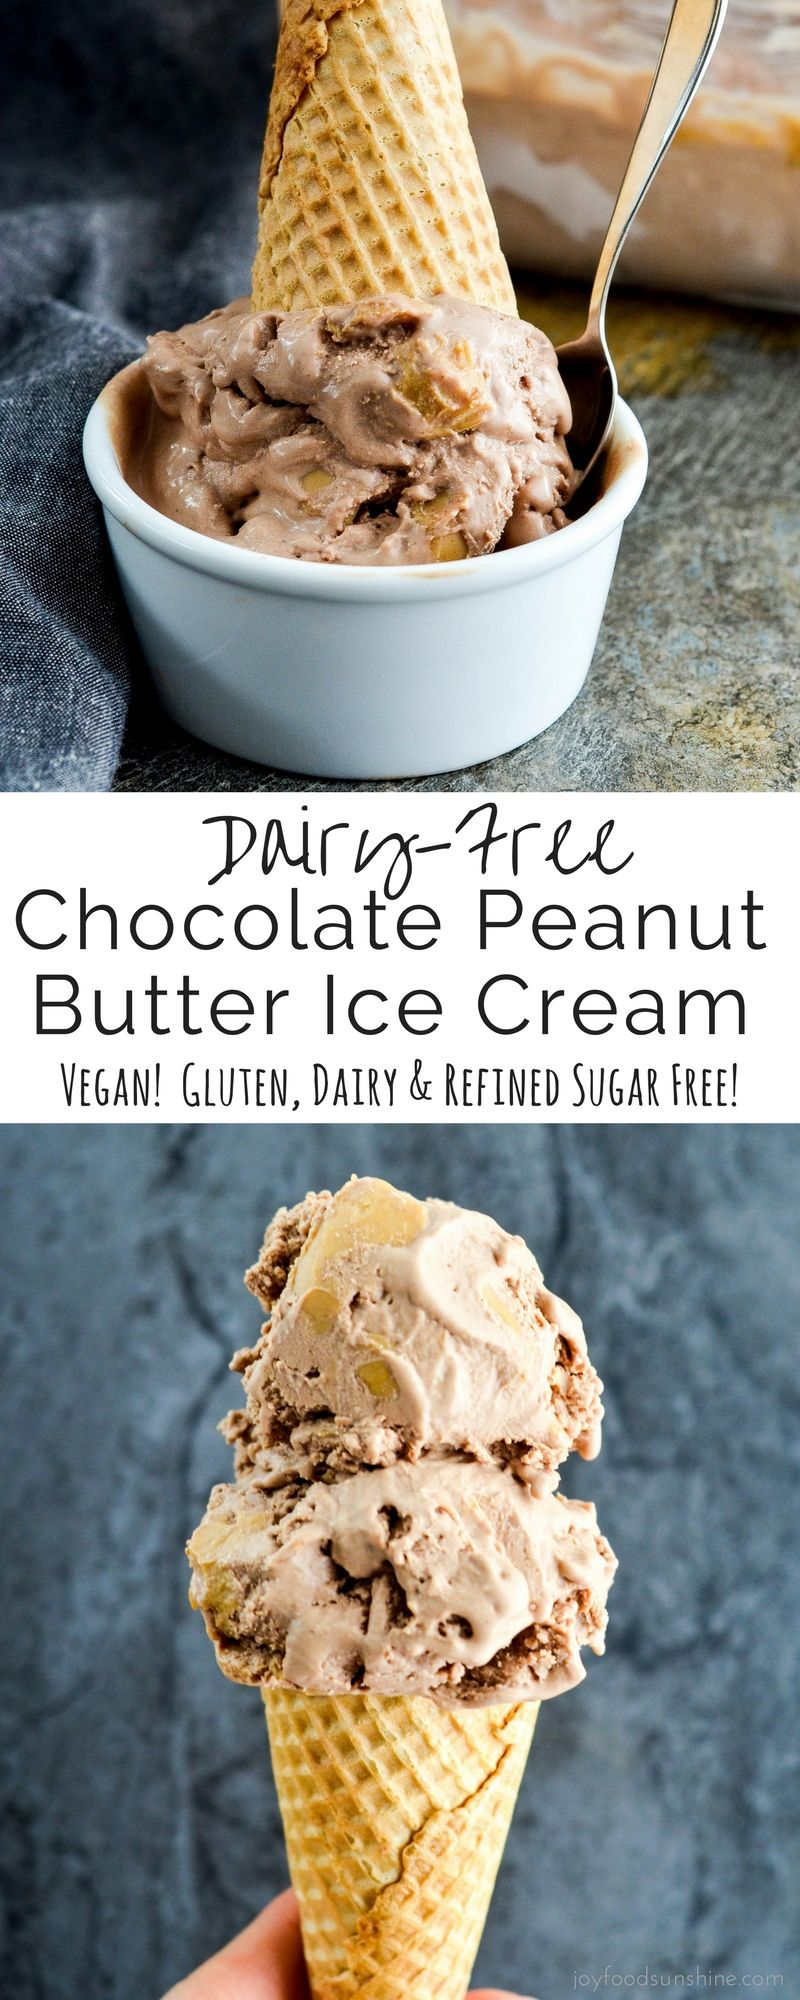 Dairy Free Chocolate Peanut Butter Ice Cream A Healthy Ice Cream